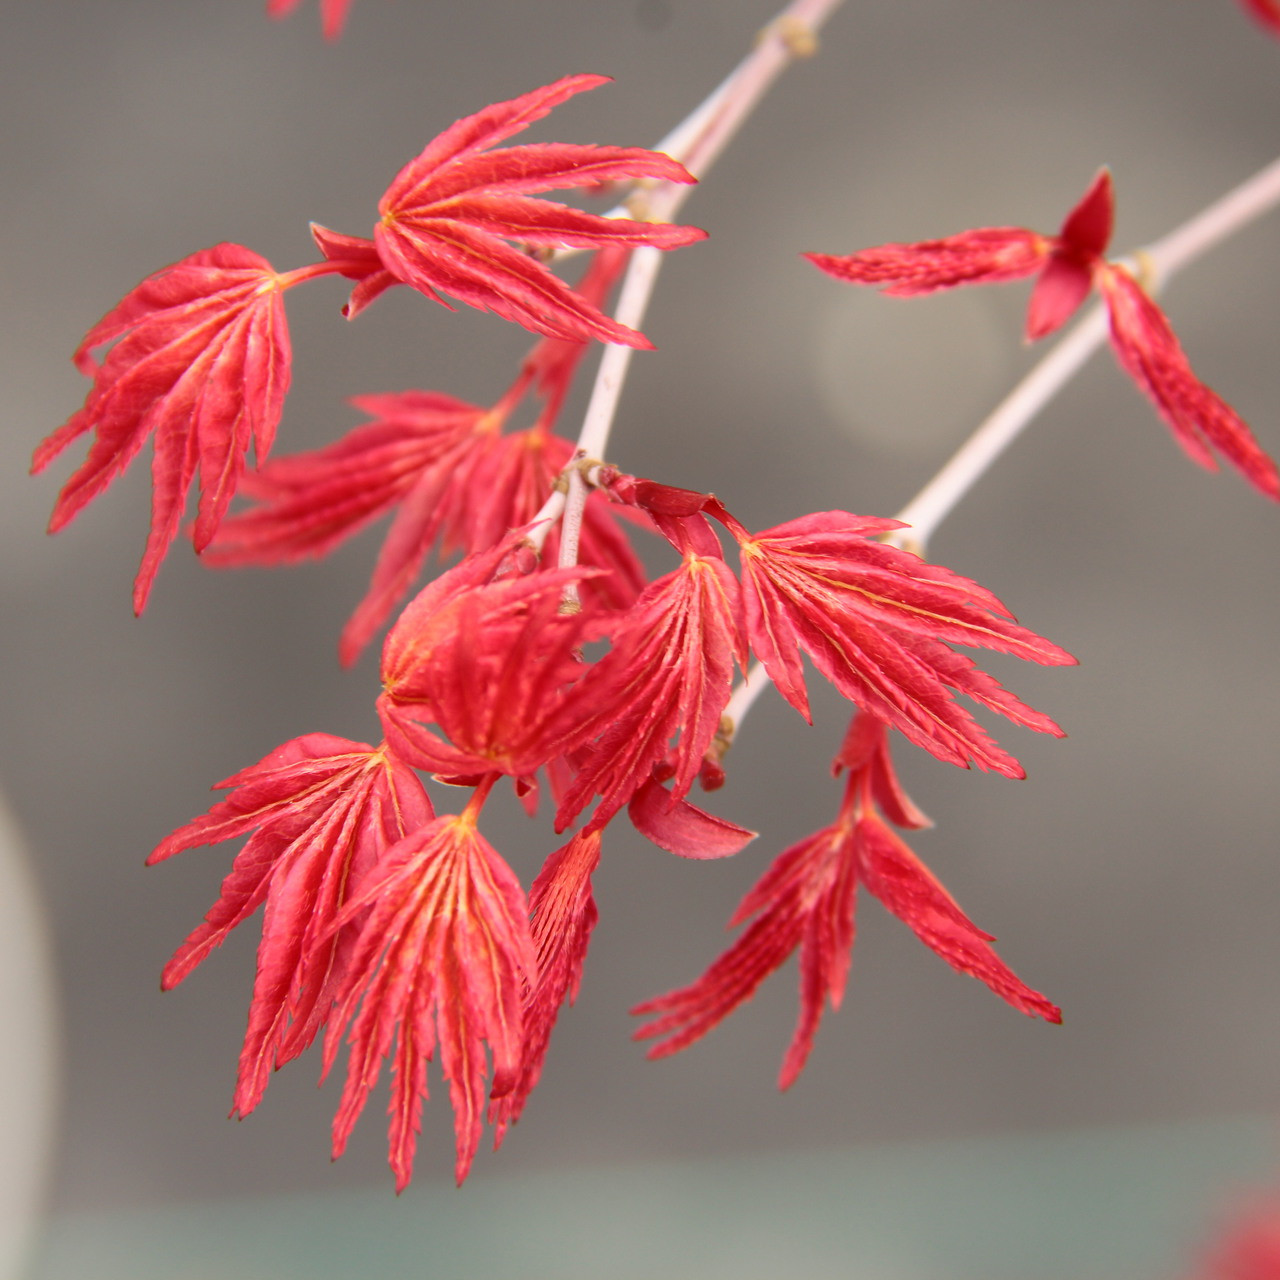 Acer Palmatum Beni Maiko Japanese Maple Conifer Kingdom